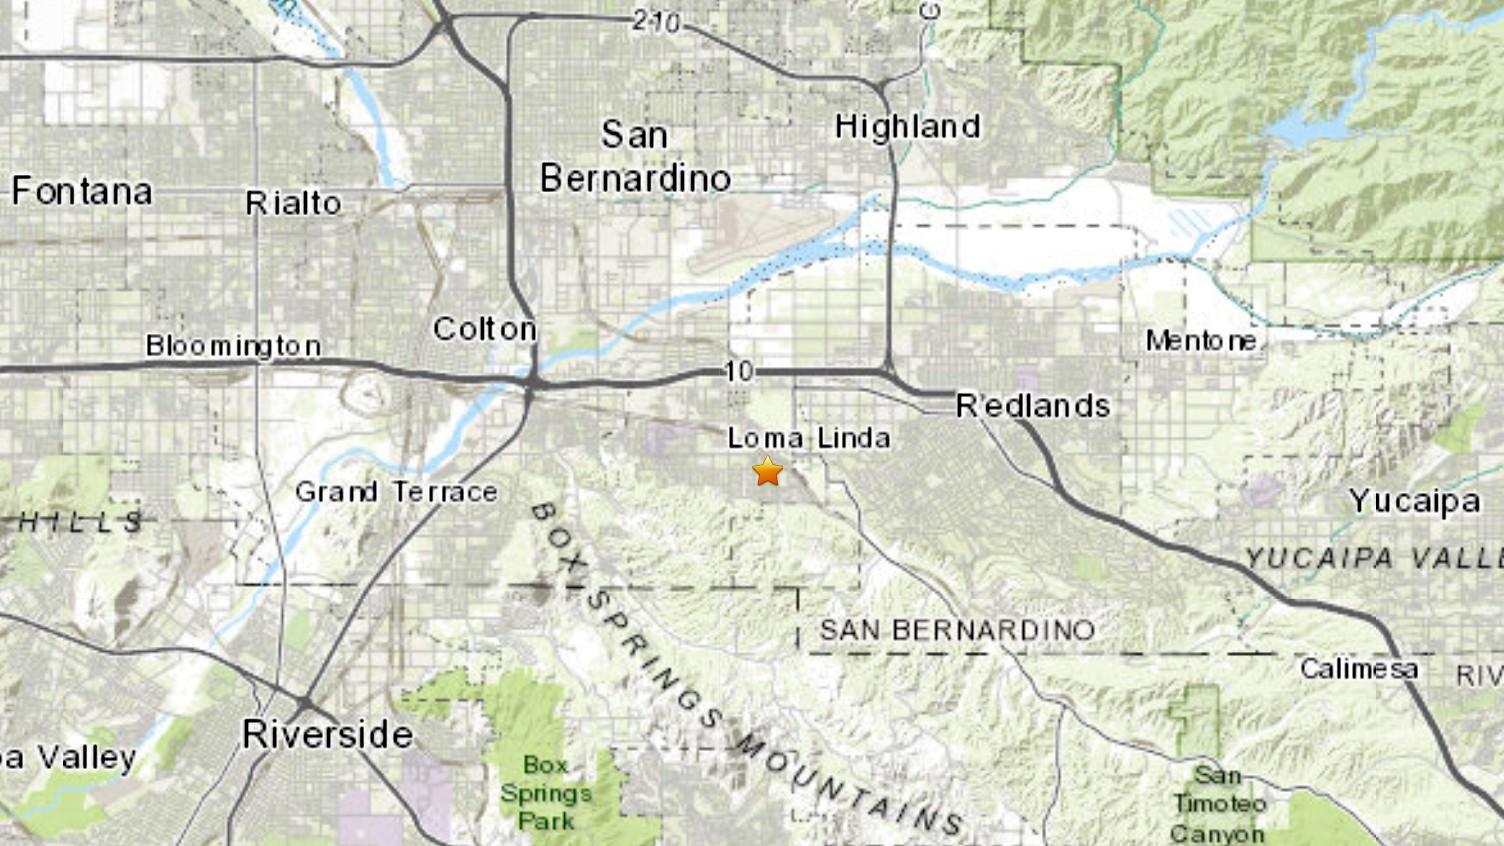 A 3.5 magnitude earthquake struck near Loma Linda on Nov. 16, 2020. (USGS)